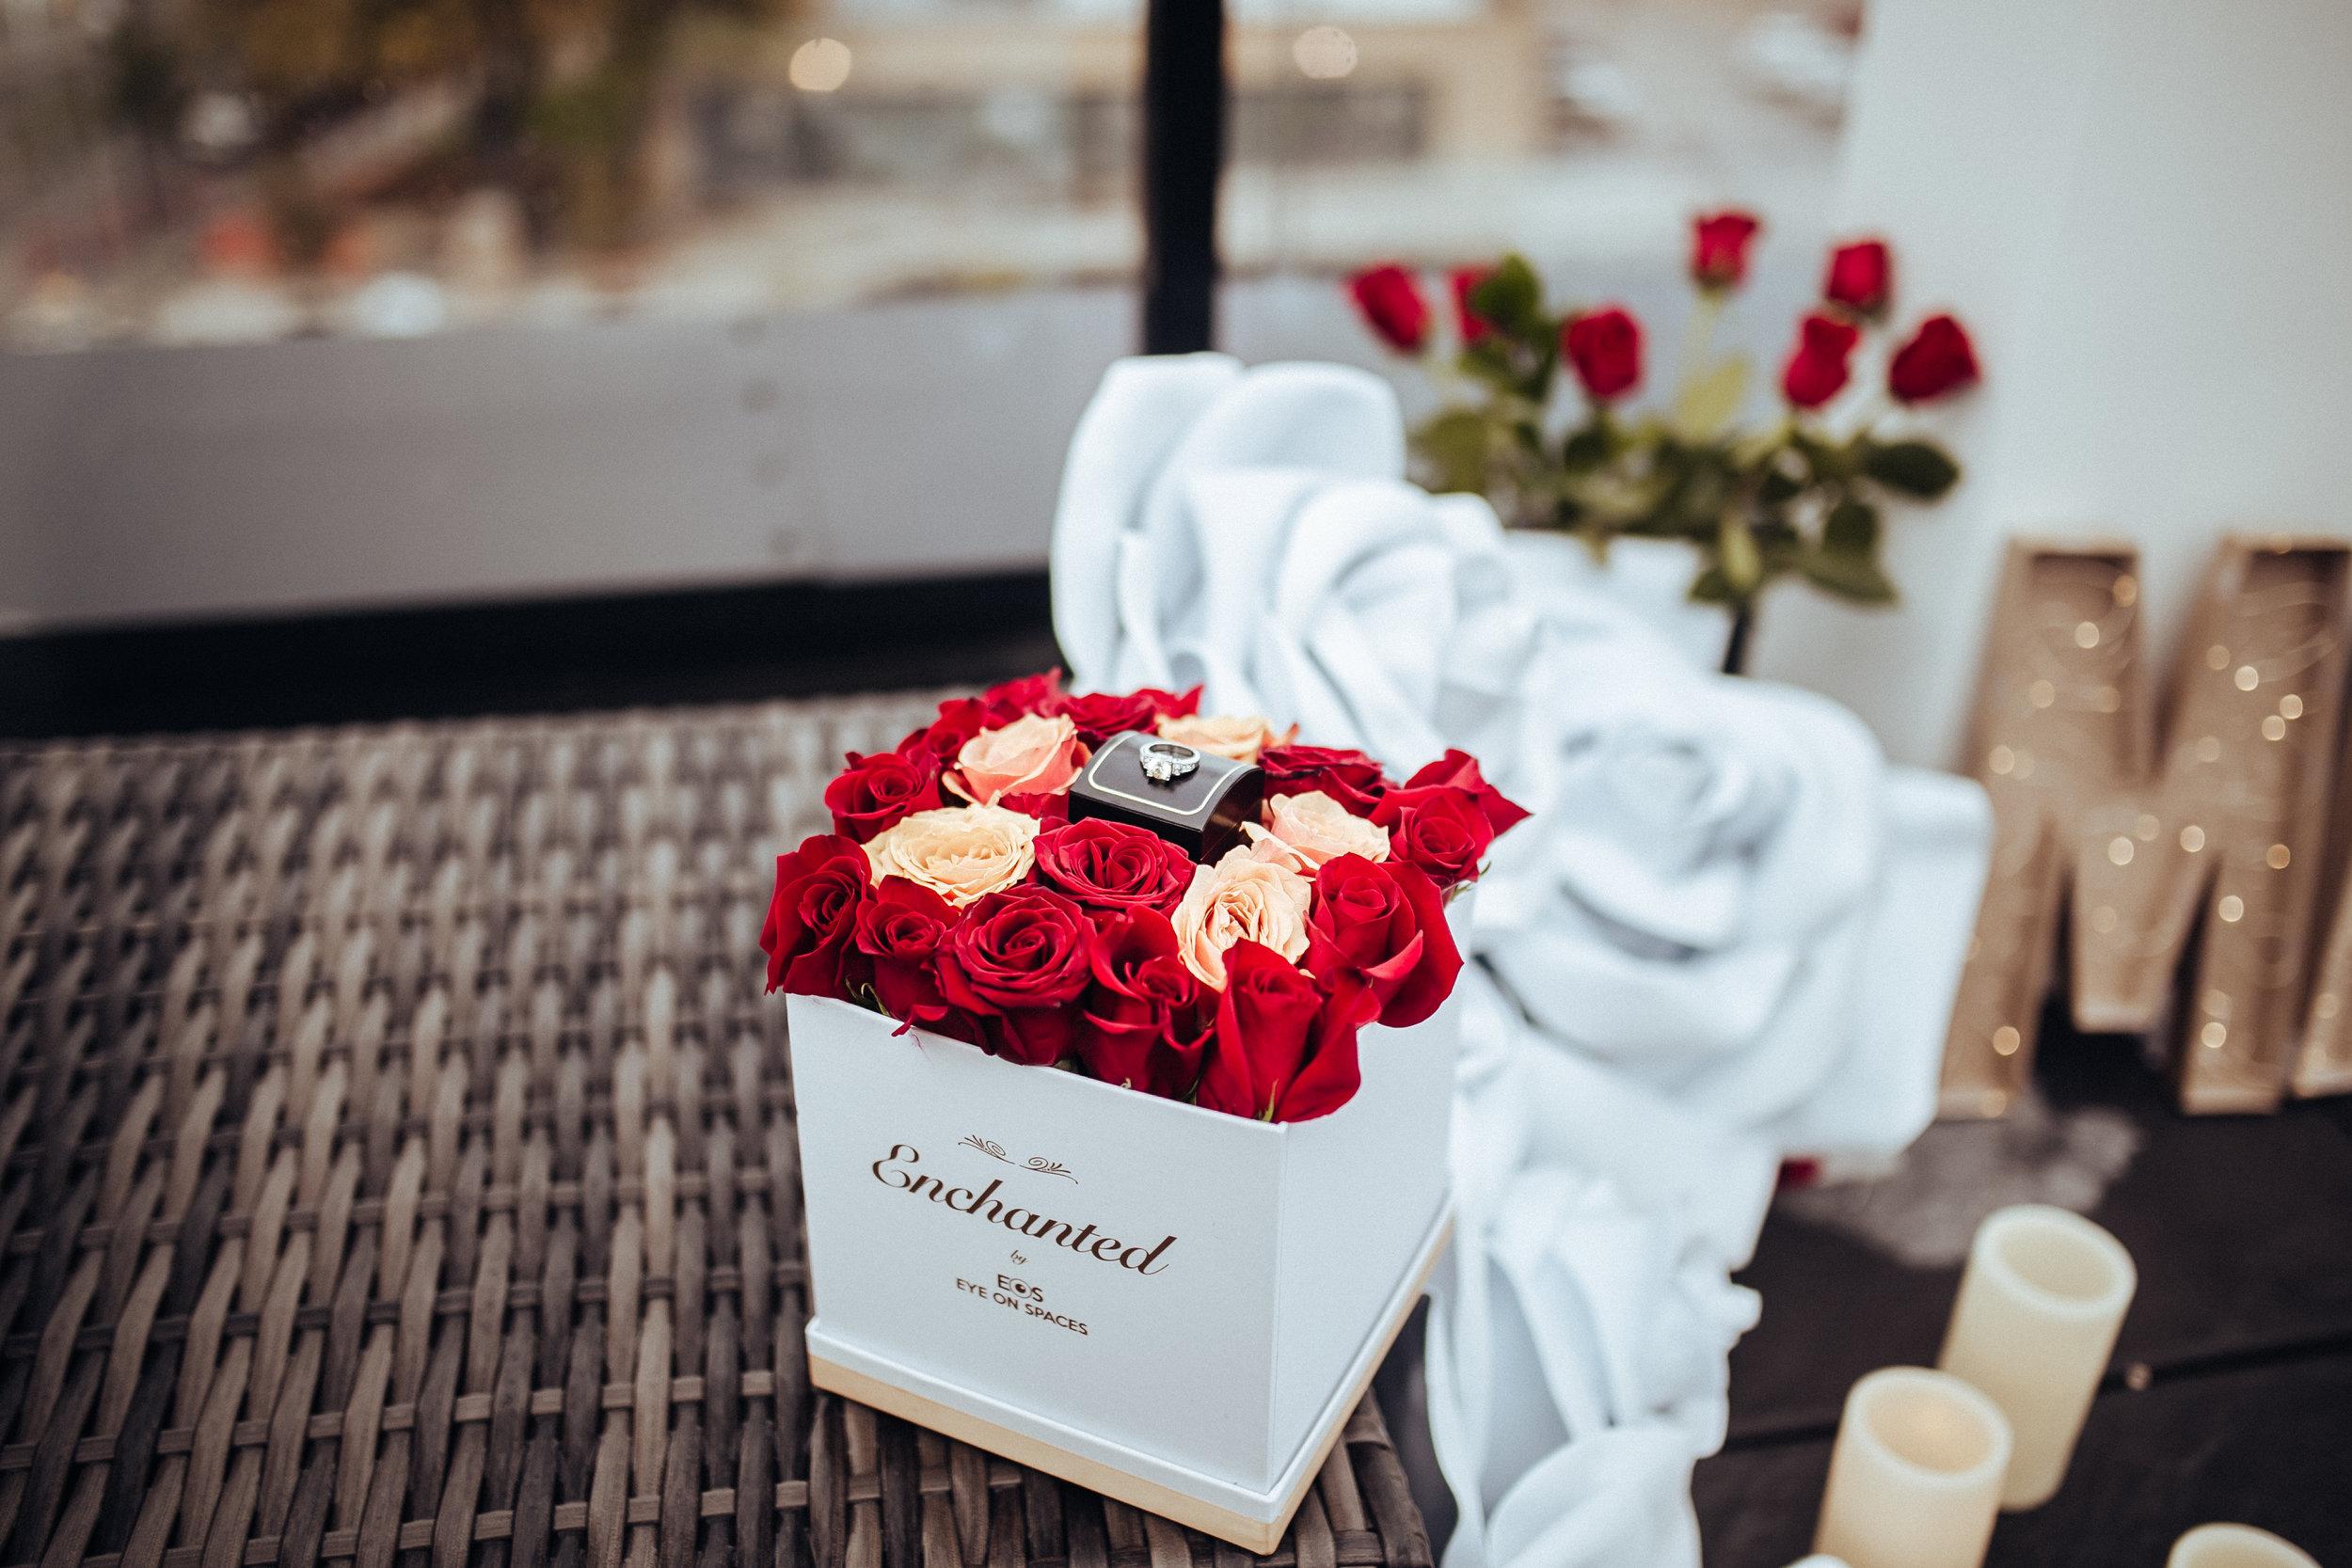 Enchanted_Proposal_2018-9.jpg